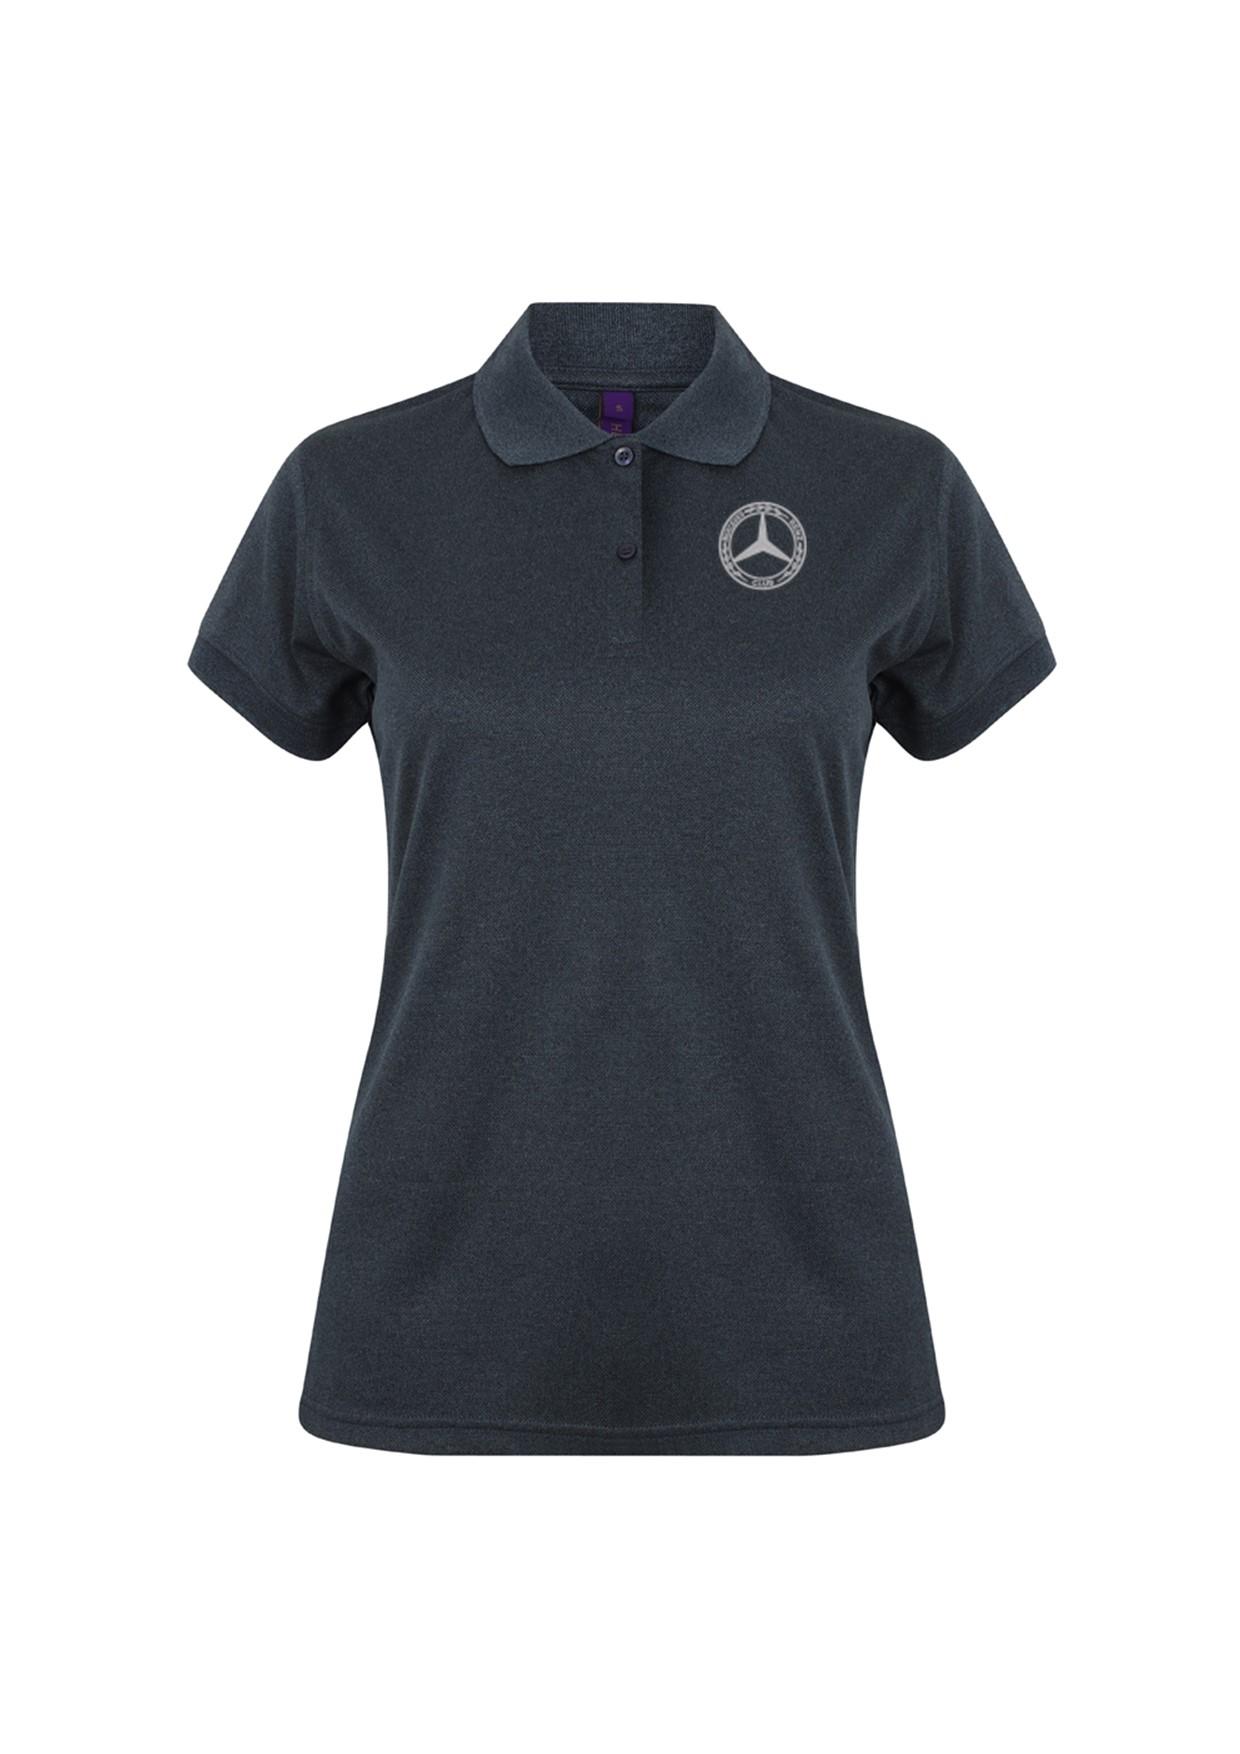 Mercedes-Benz Club Ladies Coolplus Wicking Pique Polo Shirt Heather Charcoal